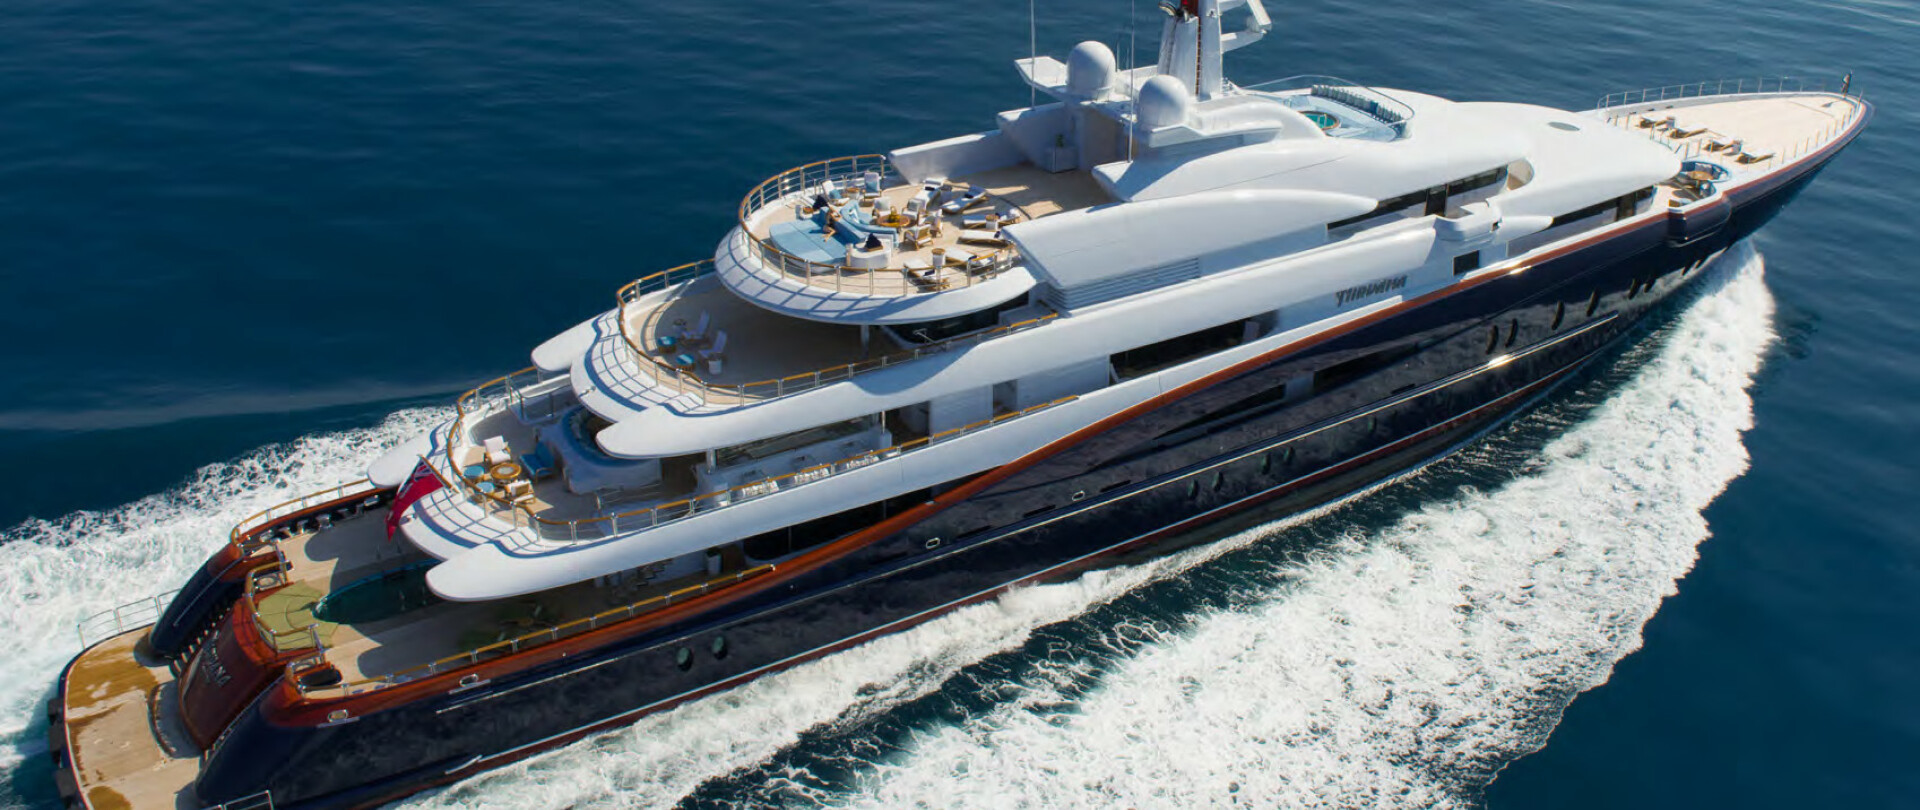 NIRVANA Yacht for Sale photo 1